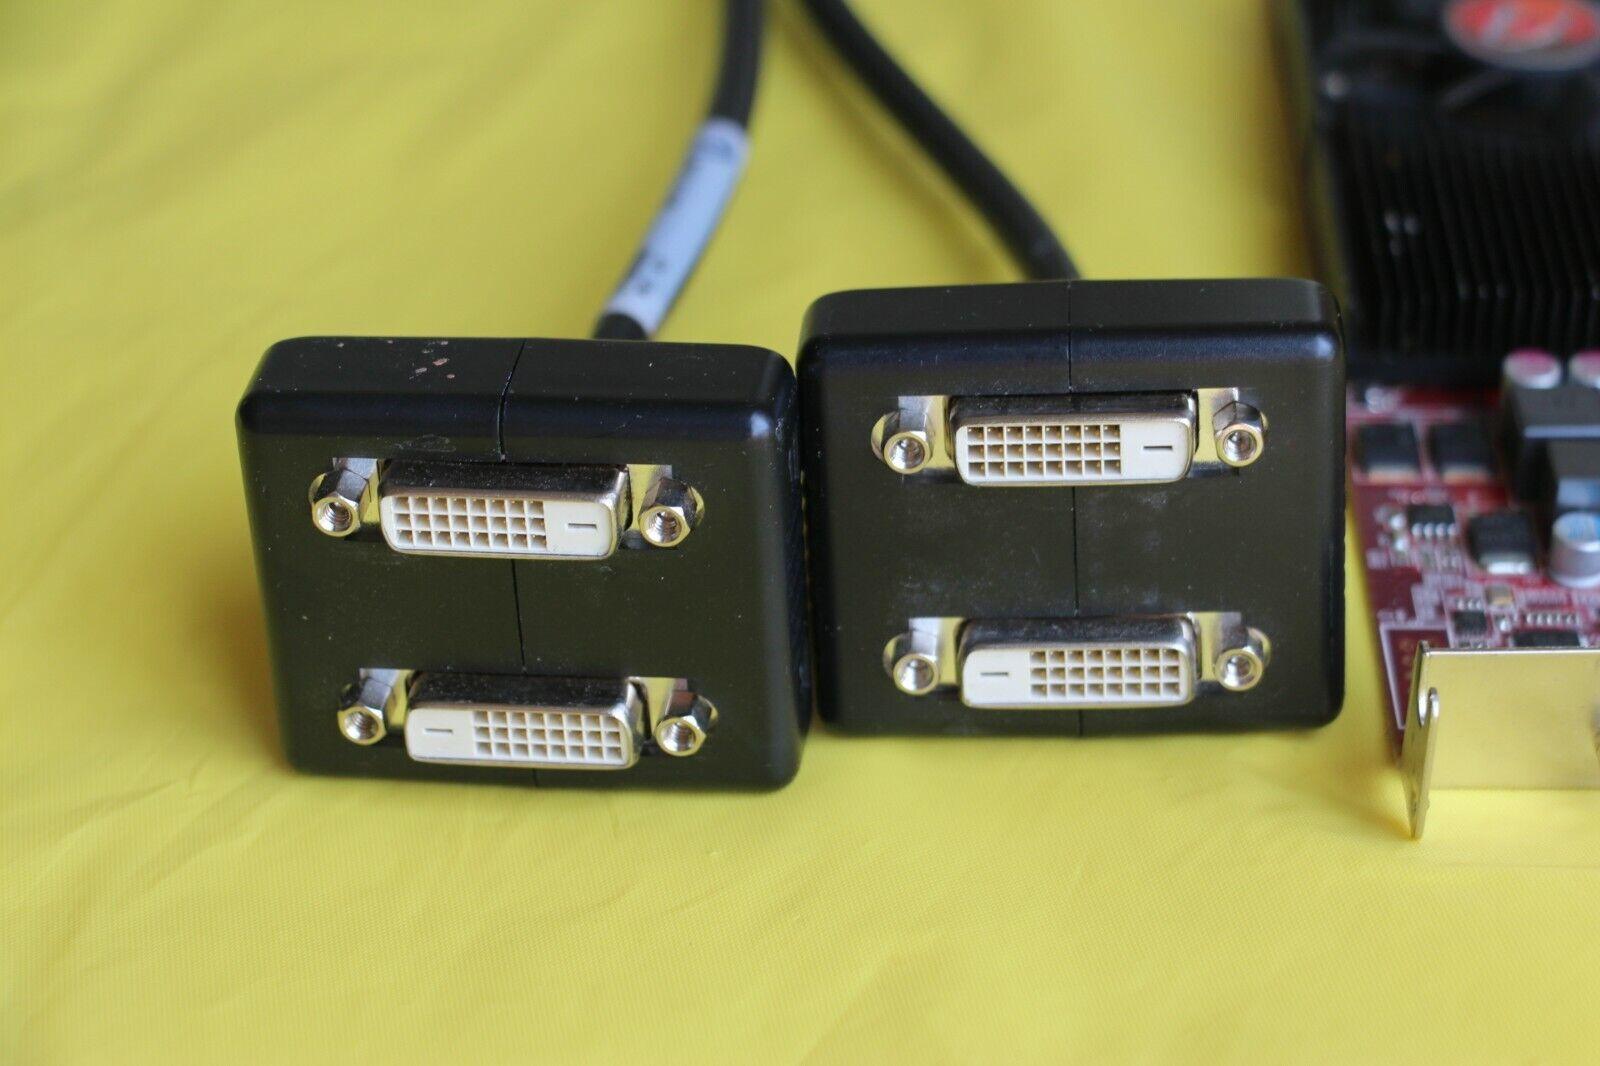 VisionTek Radeon 5570 SFF 1GB DDR3 4M VHDCI DVI (4x DVI-D), Supports 4 monitors